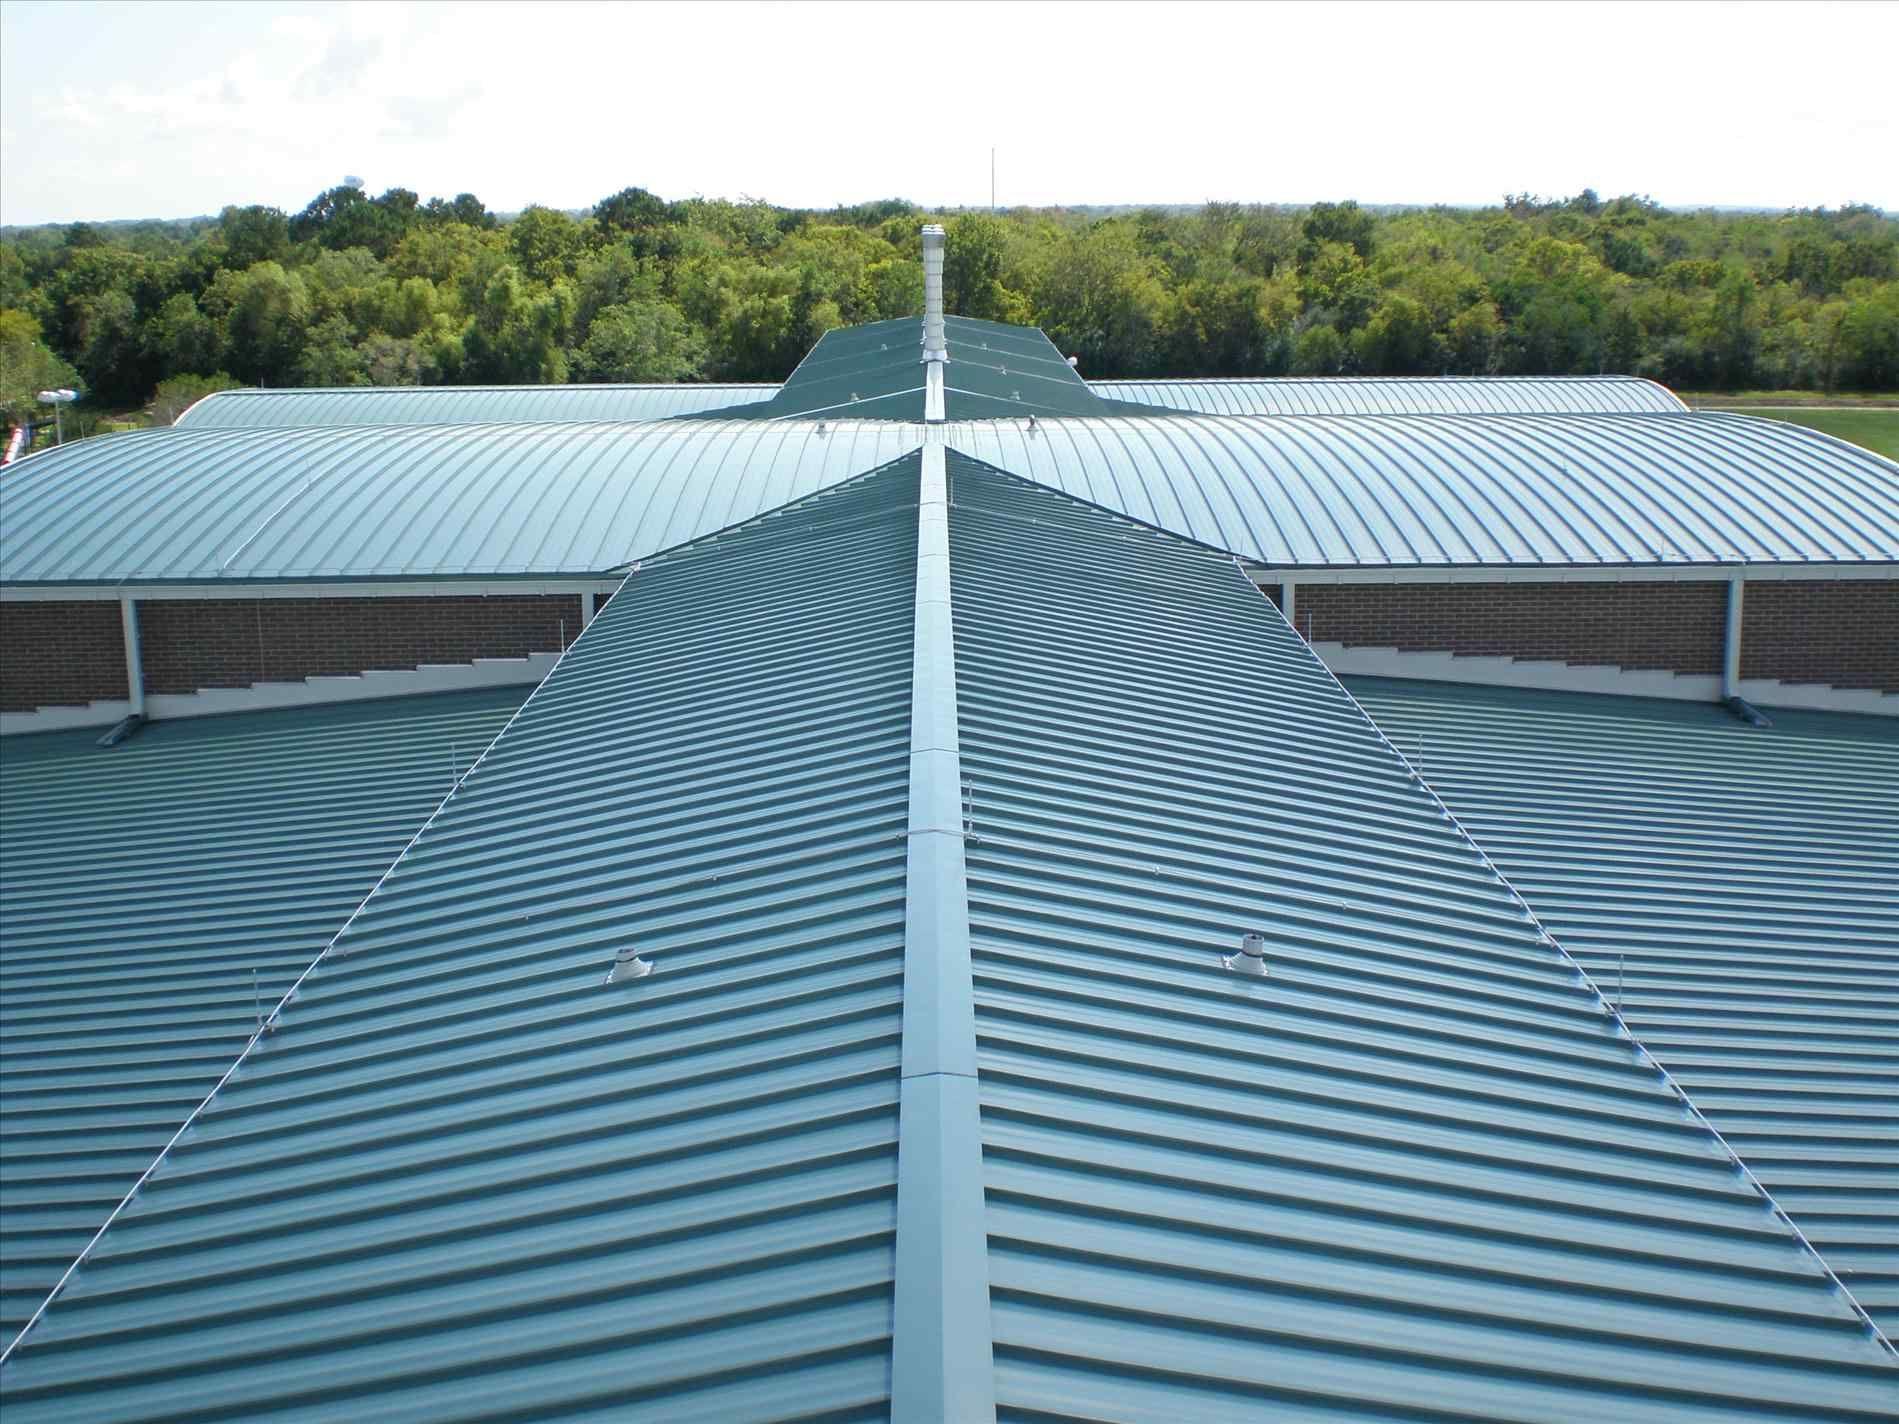 Metal Roofing Saskatchewan Roofing Metal Roof Roof Design